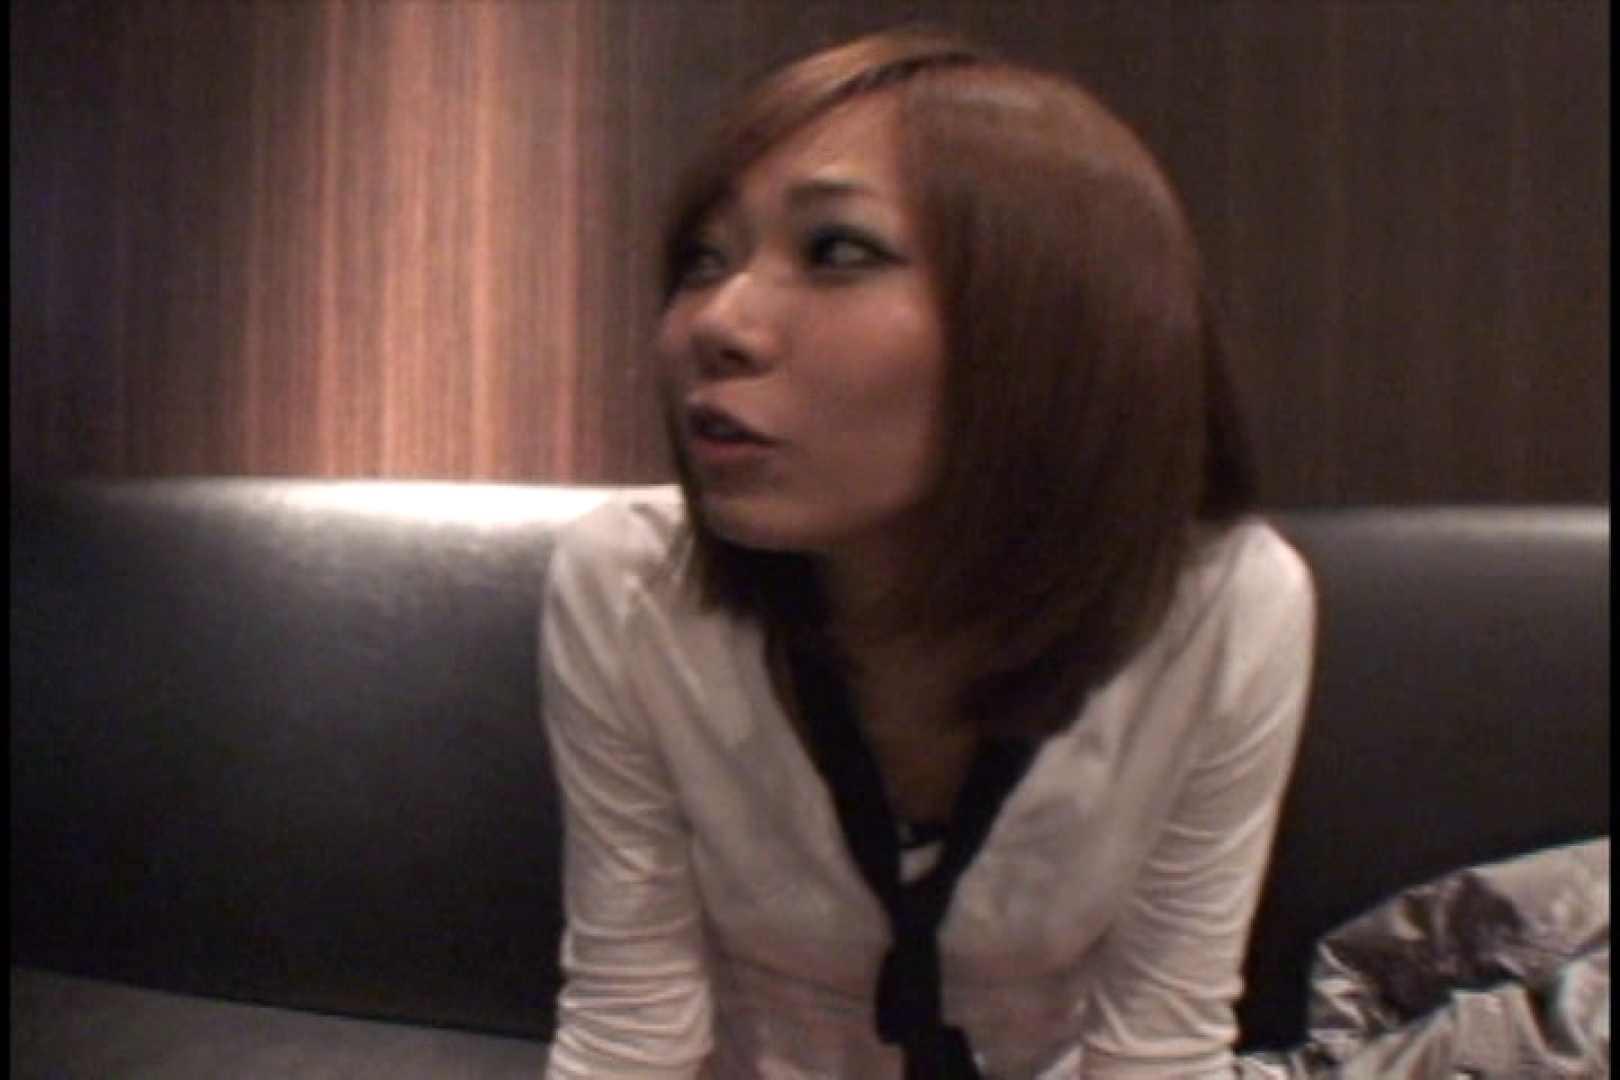 JDハンター全国ツアー vol.036 前編 女子大生のエロ動画  85PIX 34